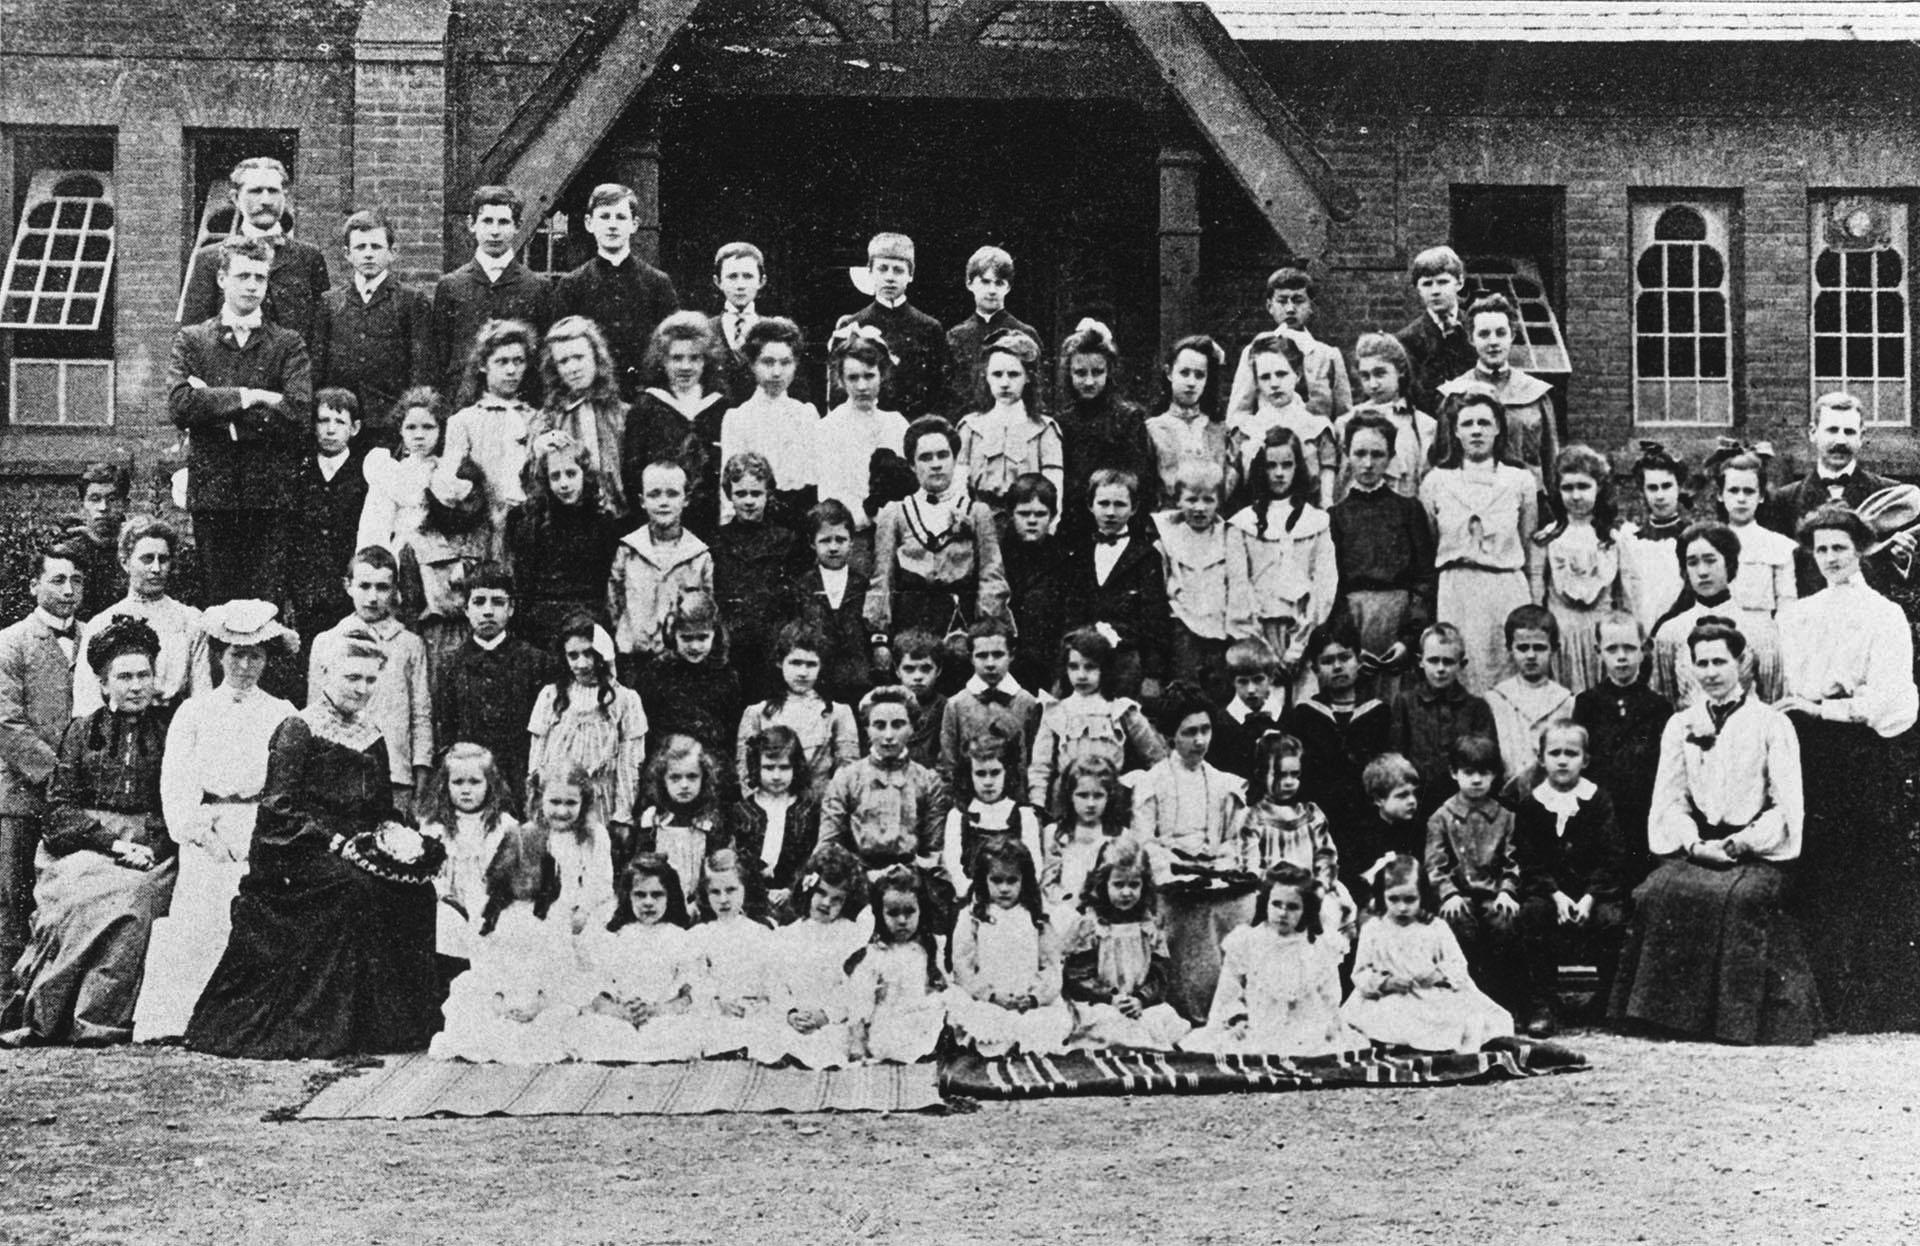 ASIJ School Group Photo from 1903